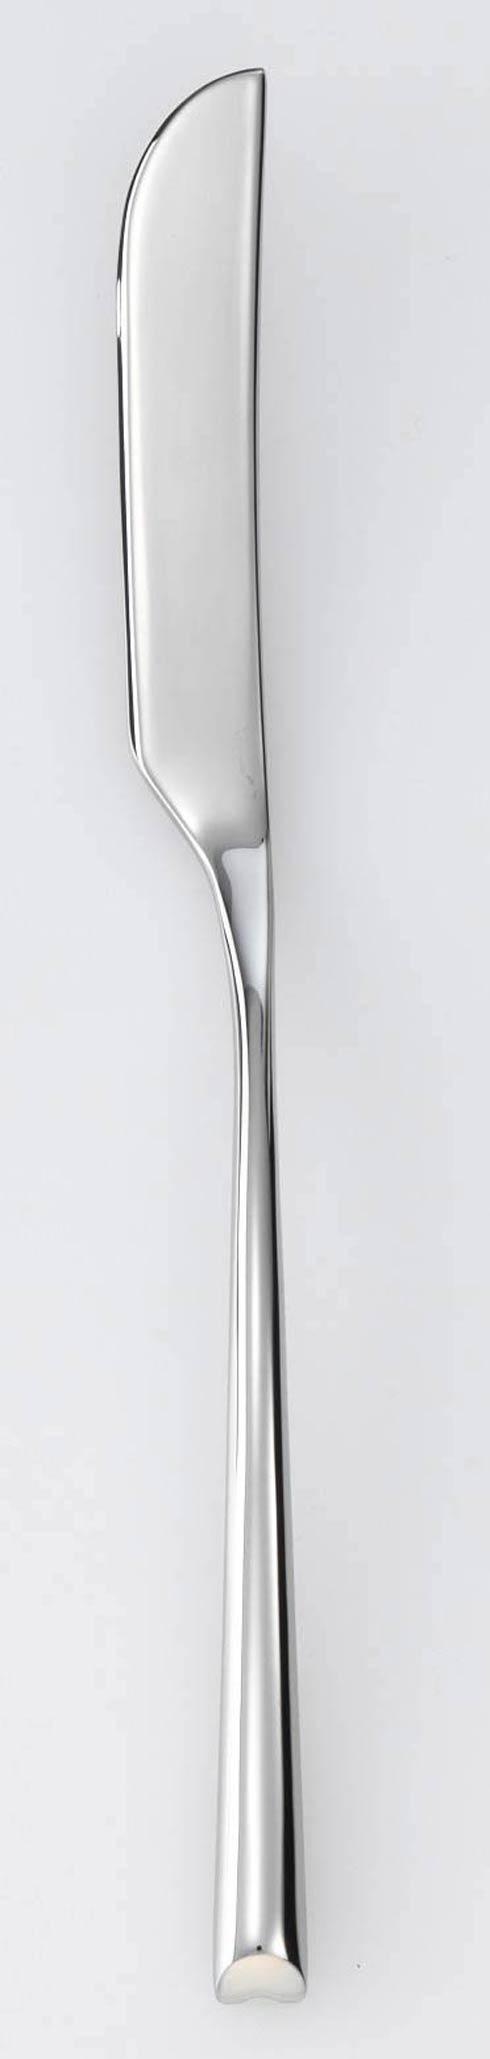 $18.00 Fish Knife